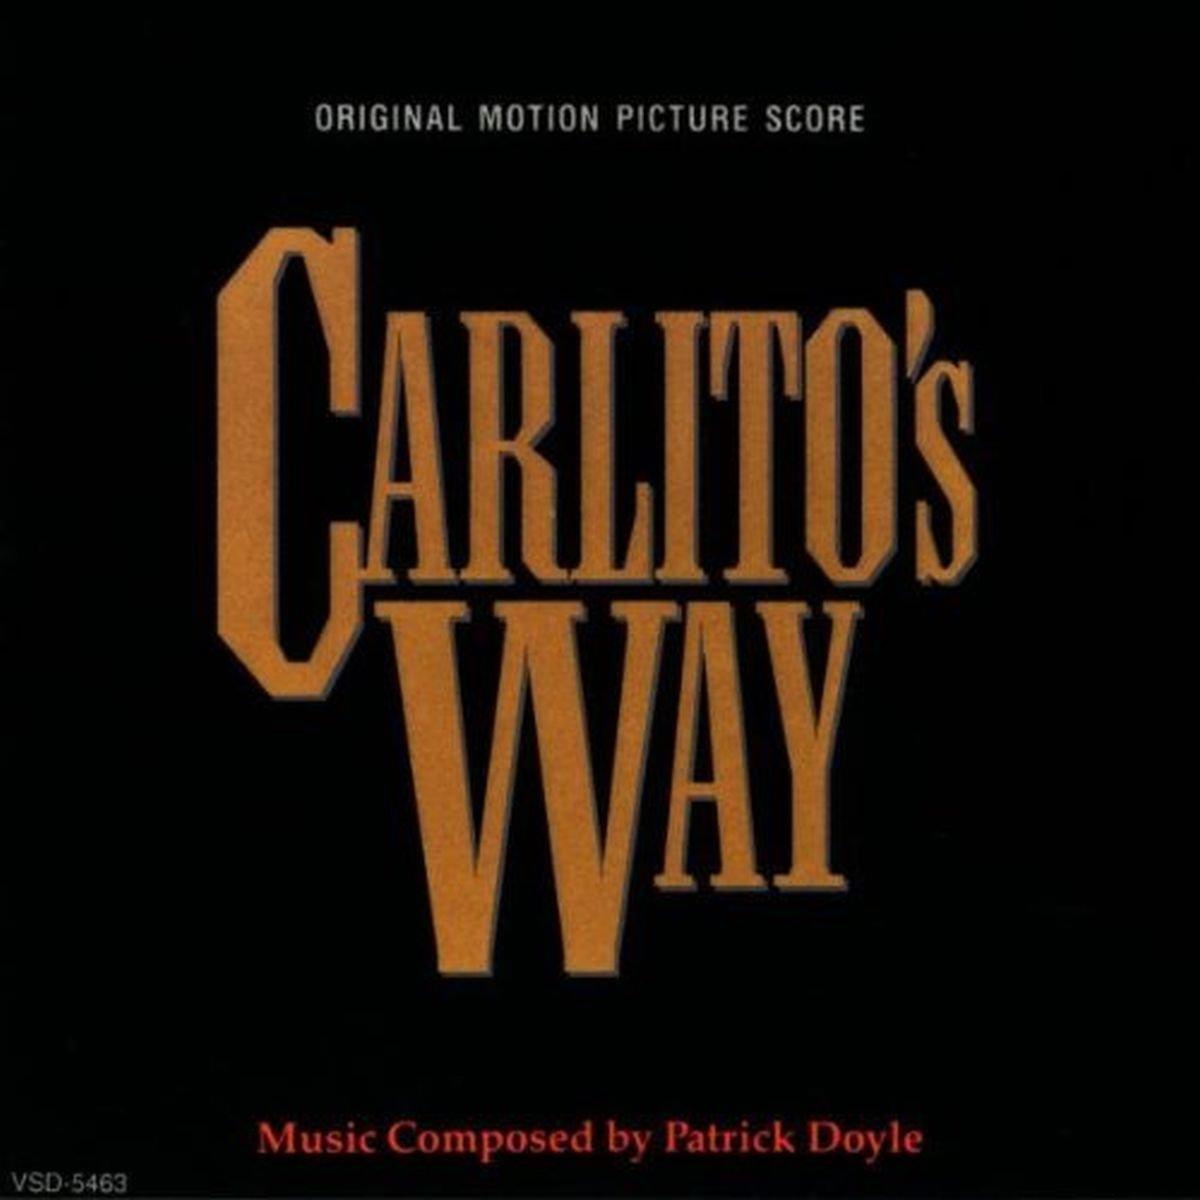 Carlito's Way - Amazon.com Music